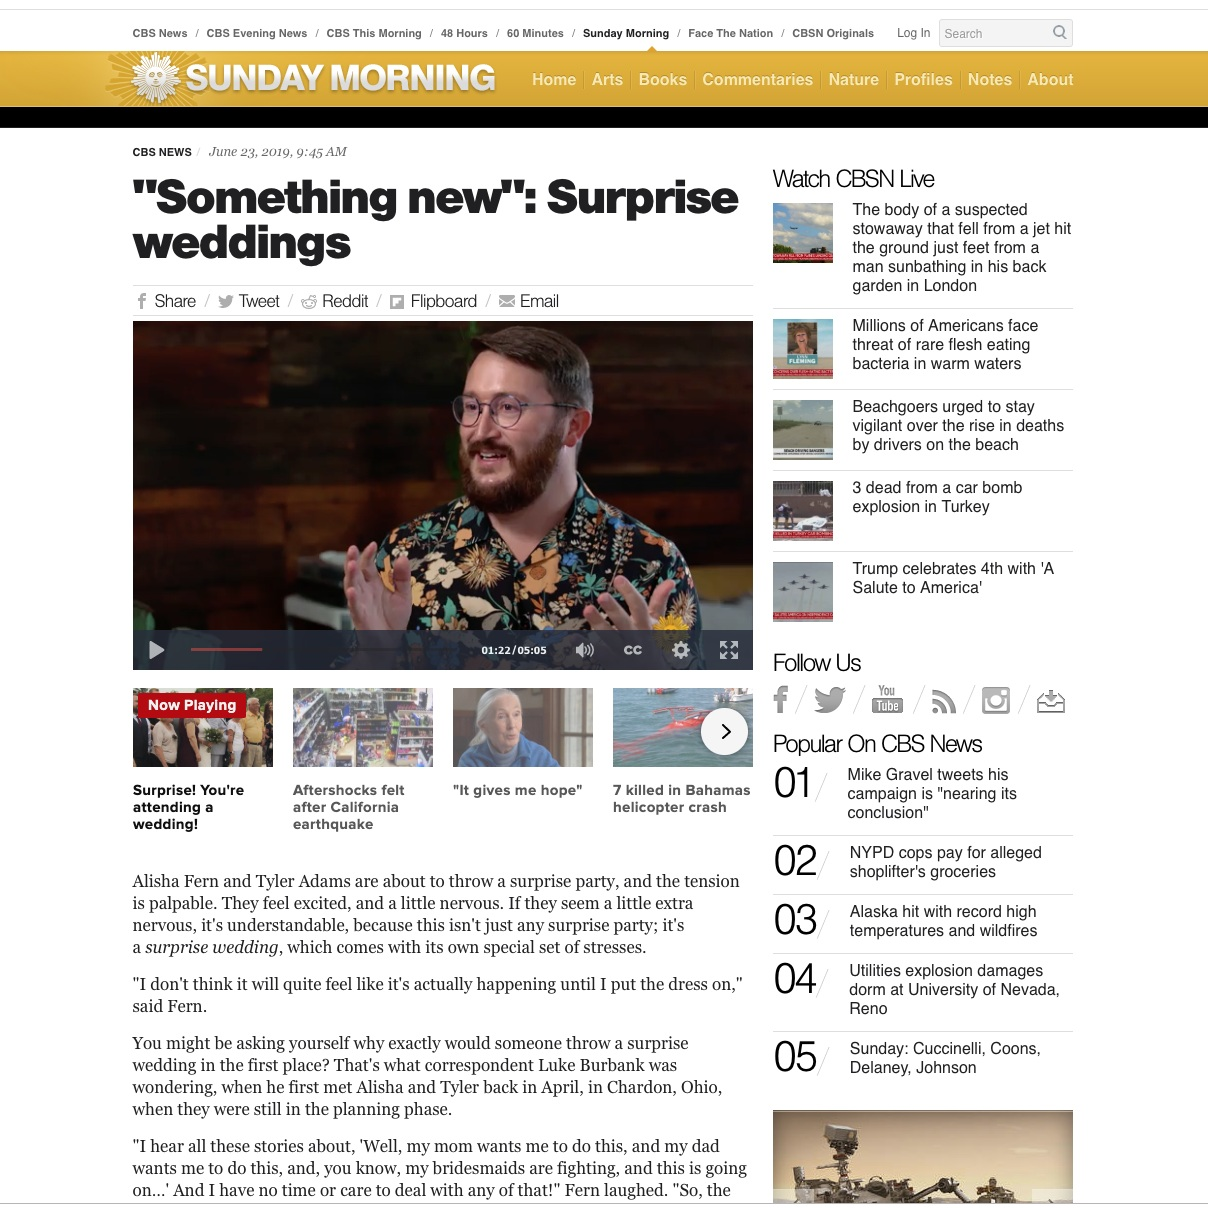 wedding expert jove meyer on cbs sunday morning